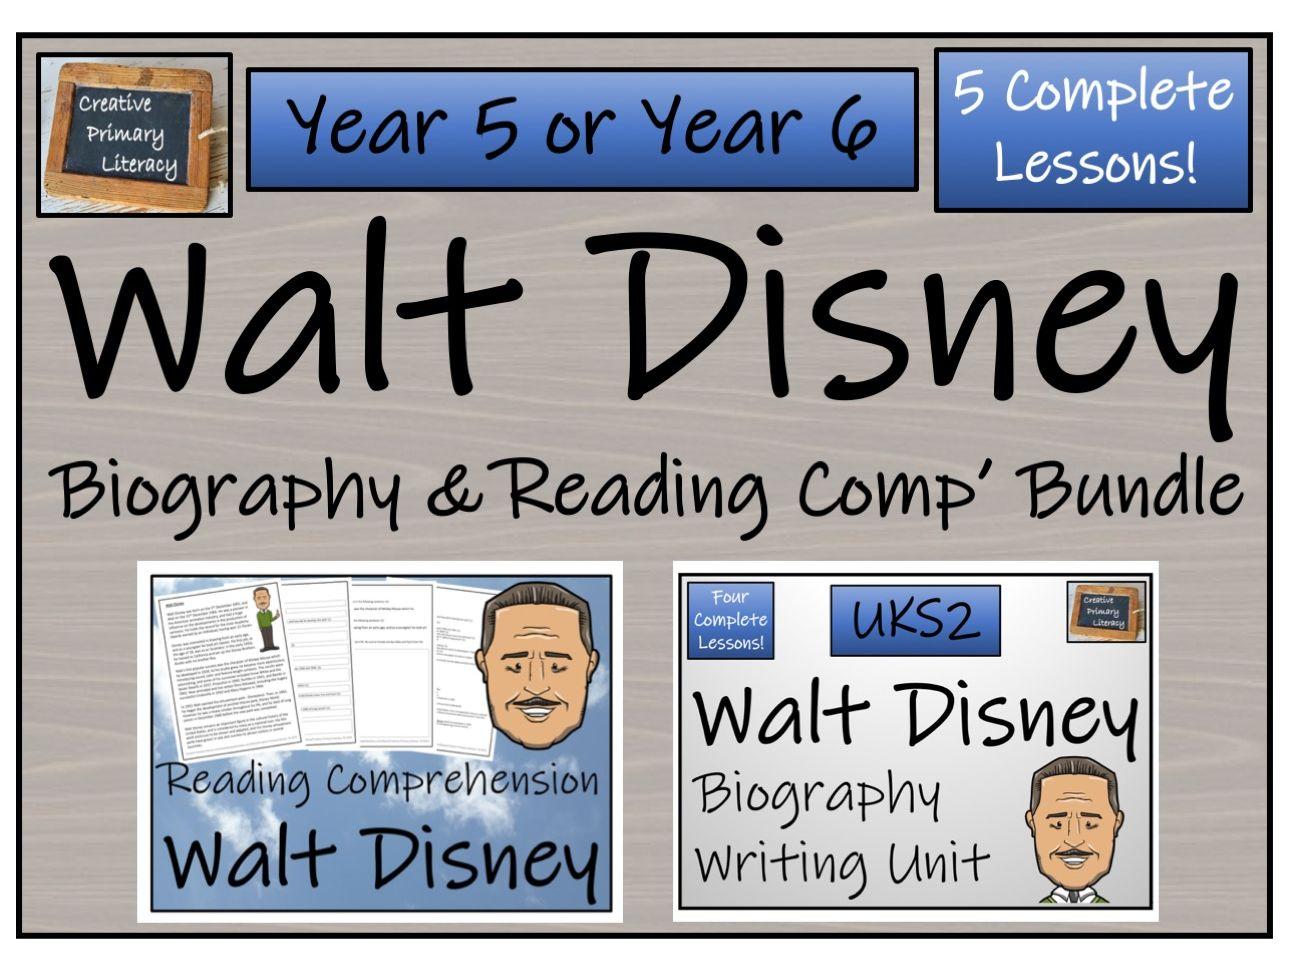 UKS2 Literacy - Walt Disney Reading Comprehension & Biography Bundle